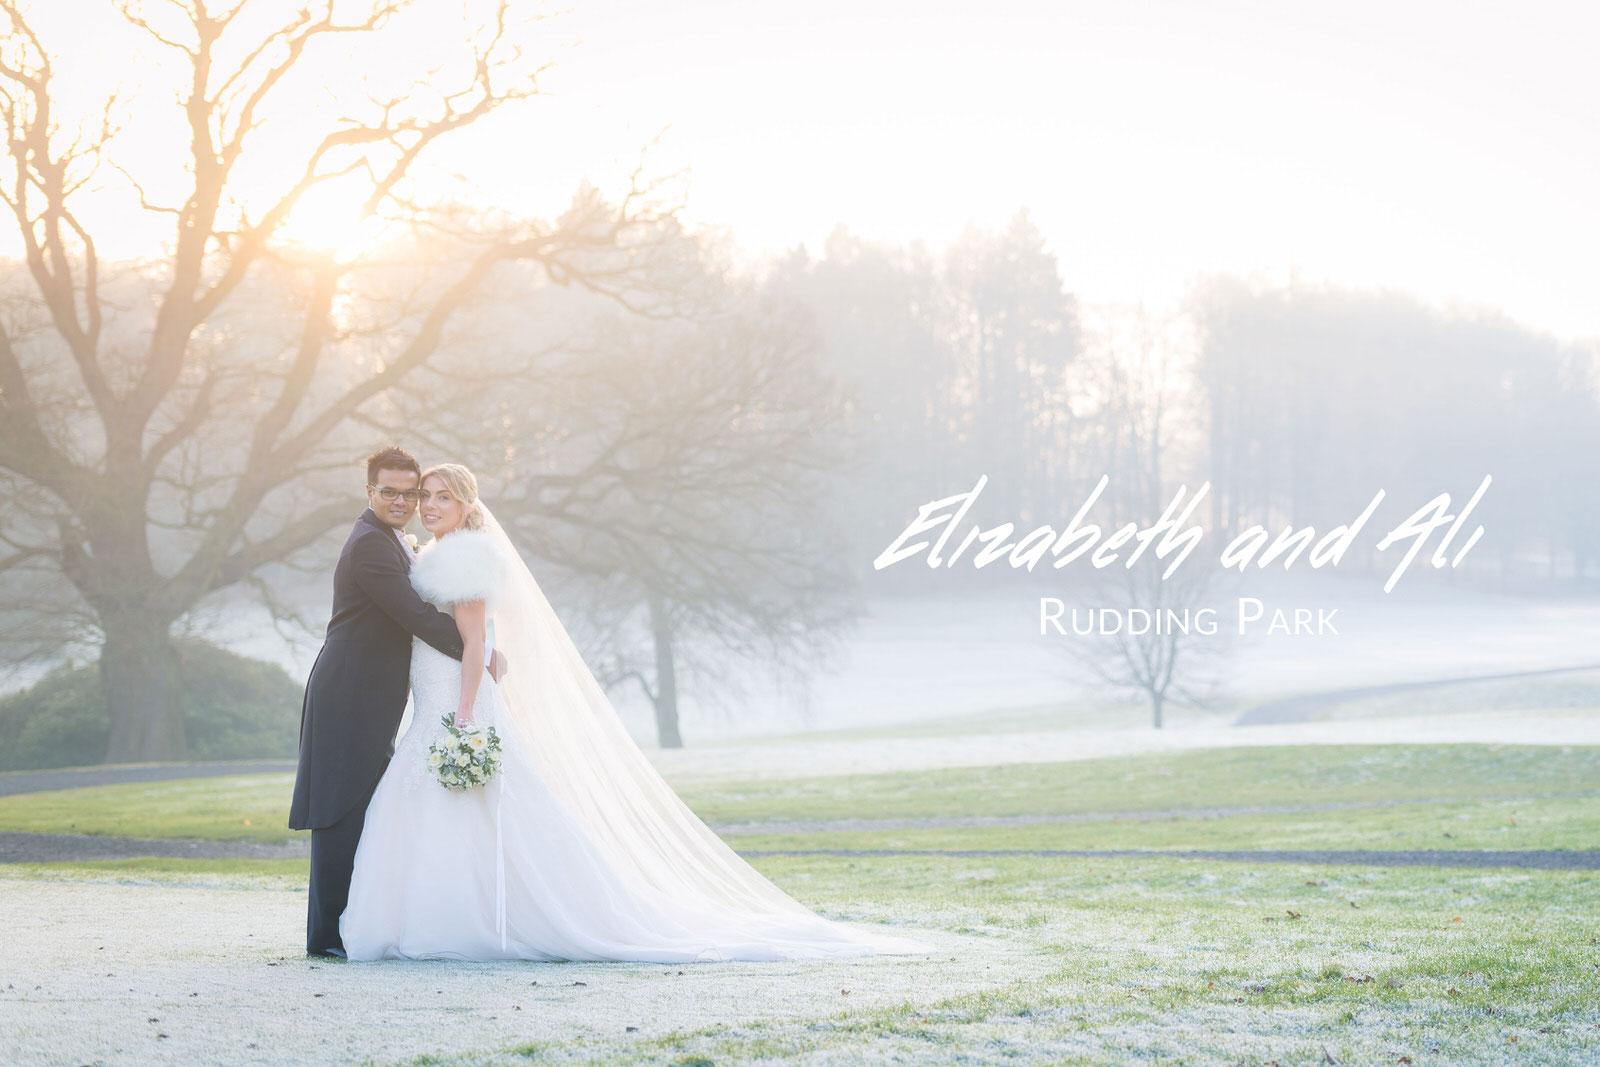 Elizabeth and Ali's Wedding - Rudding Park